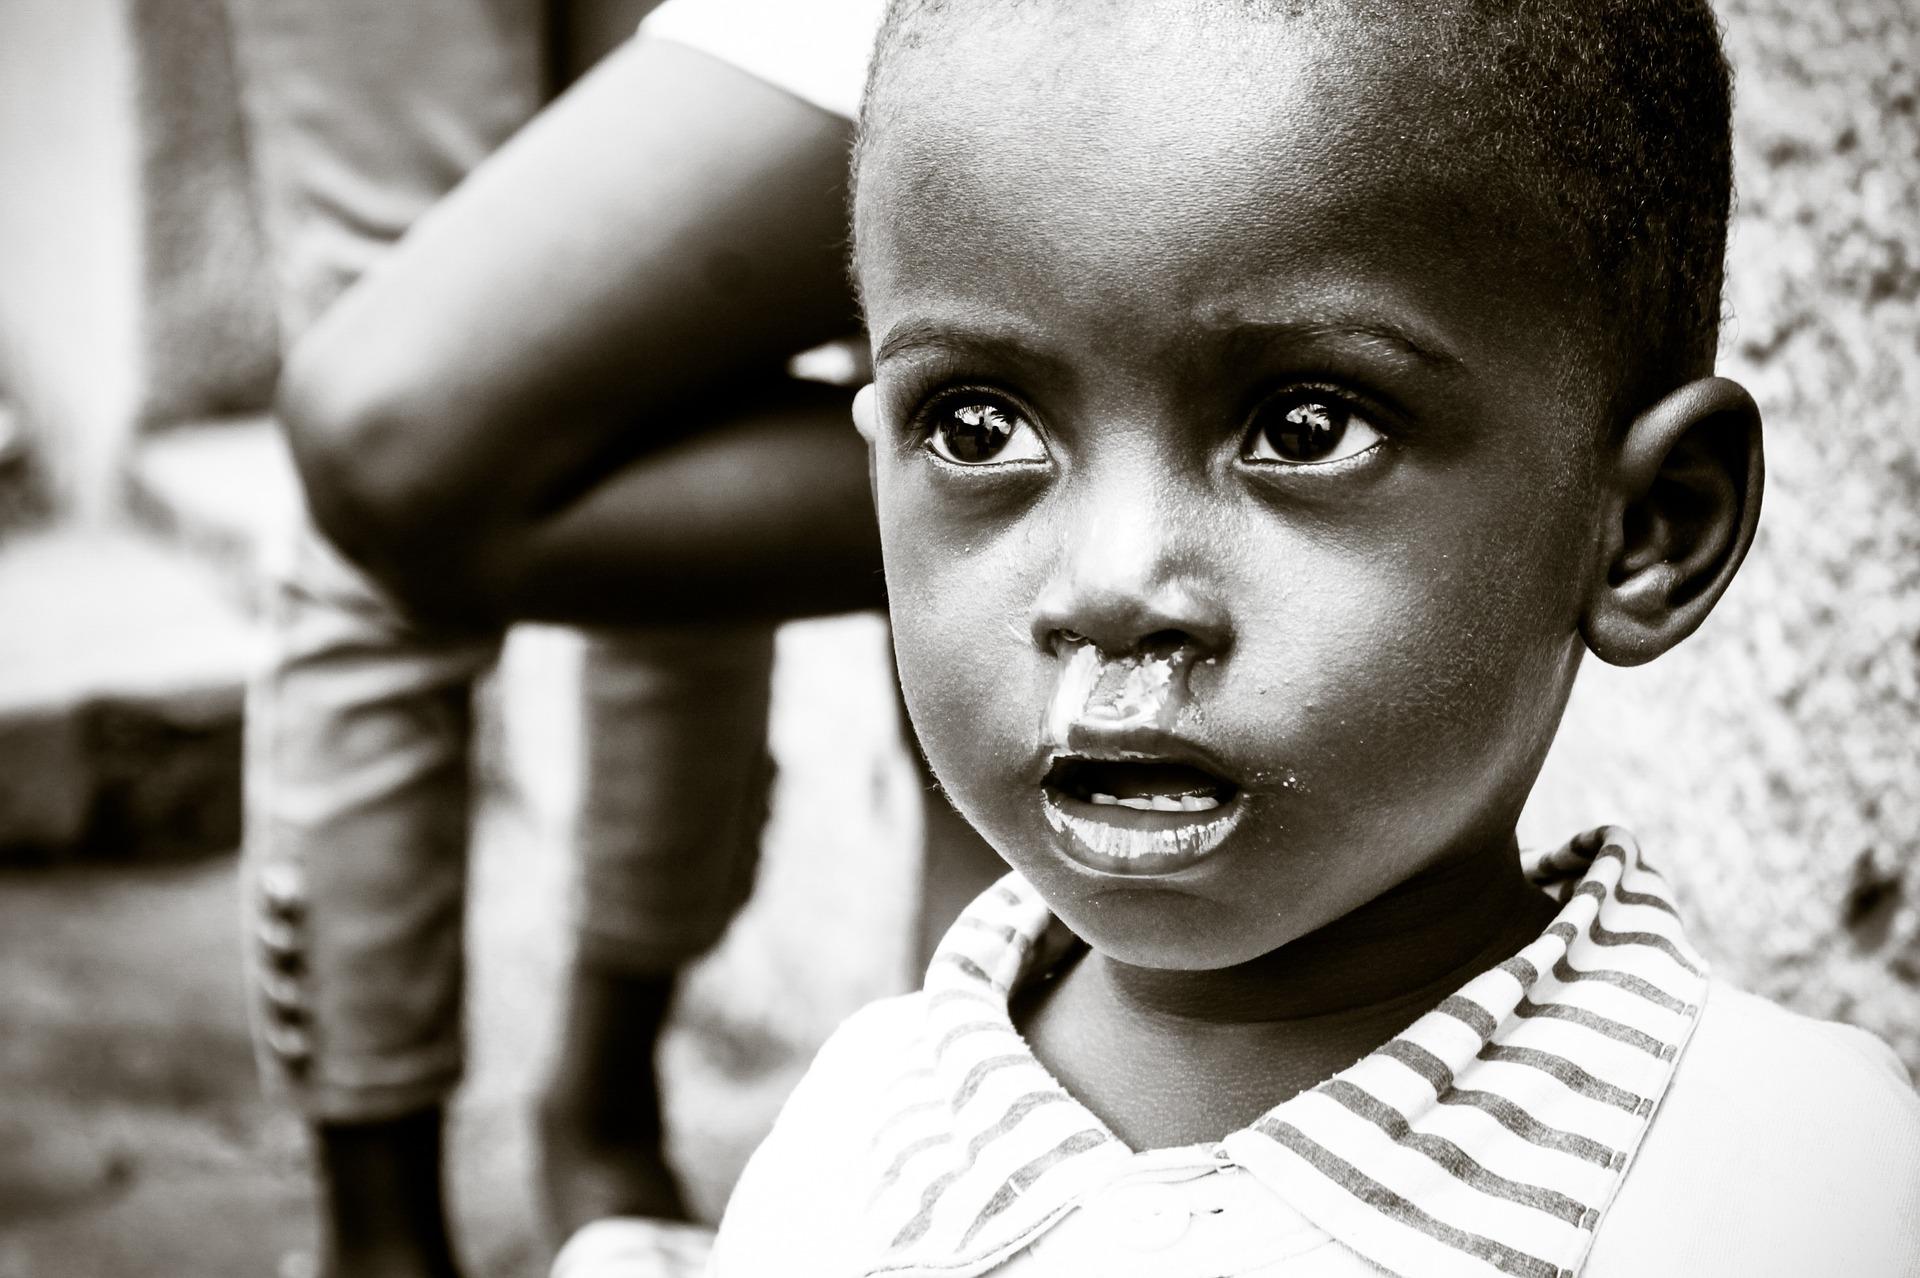 african-child-1381557_1920